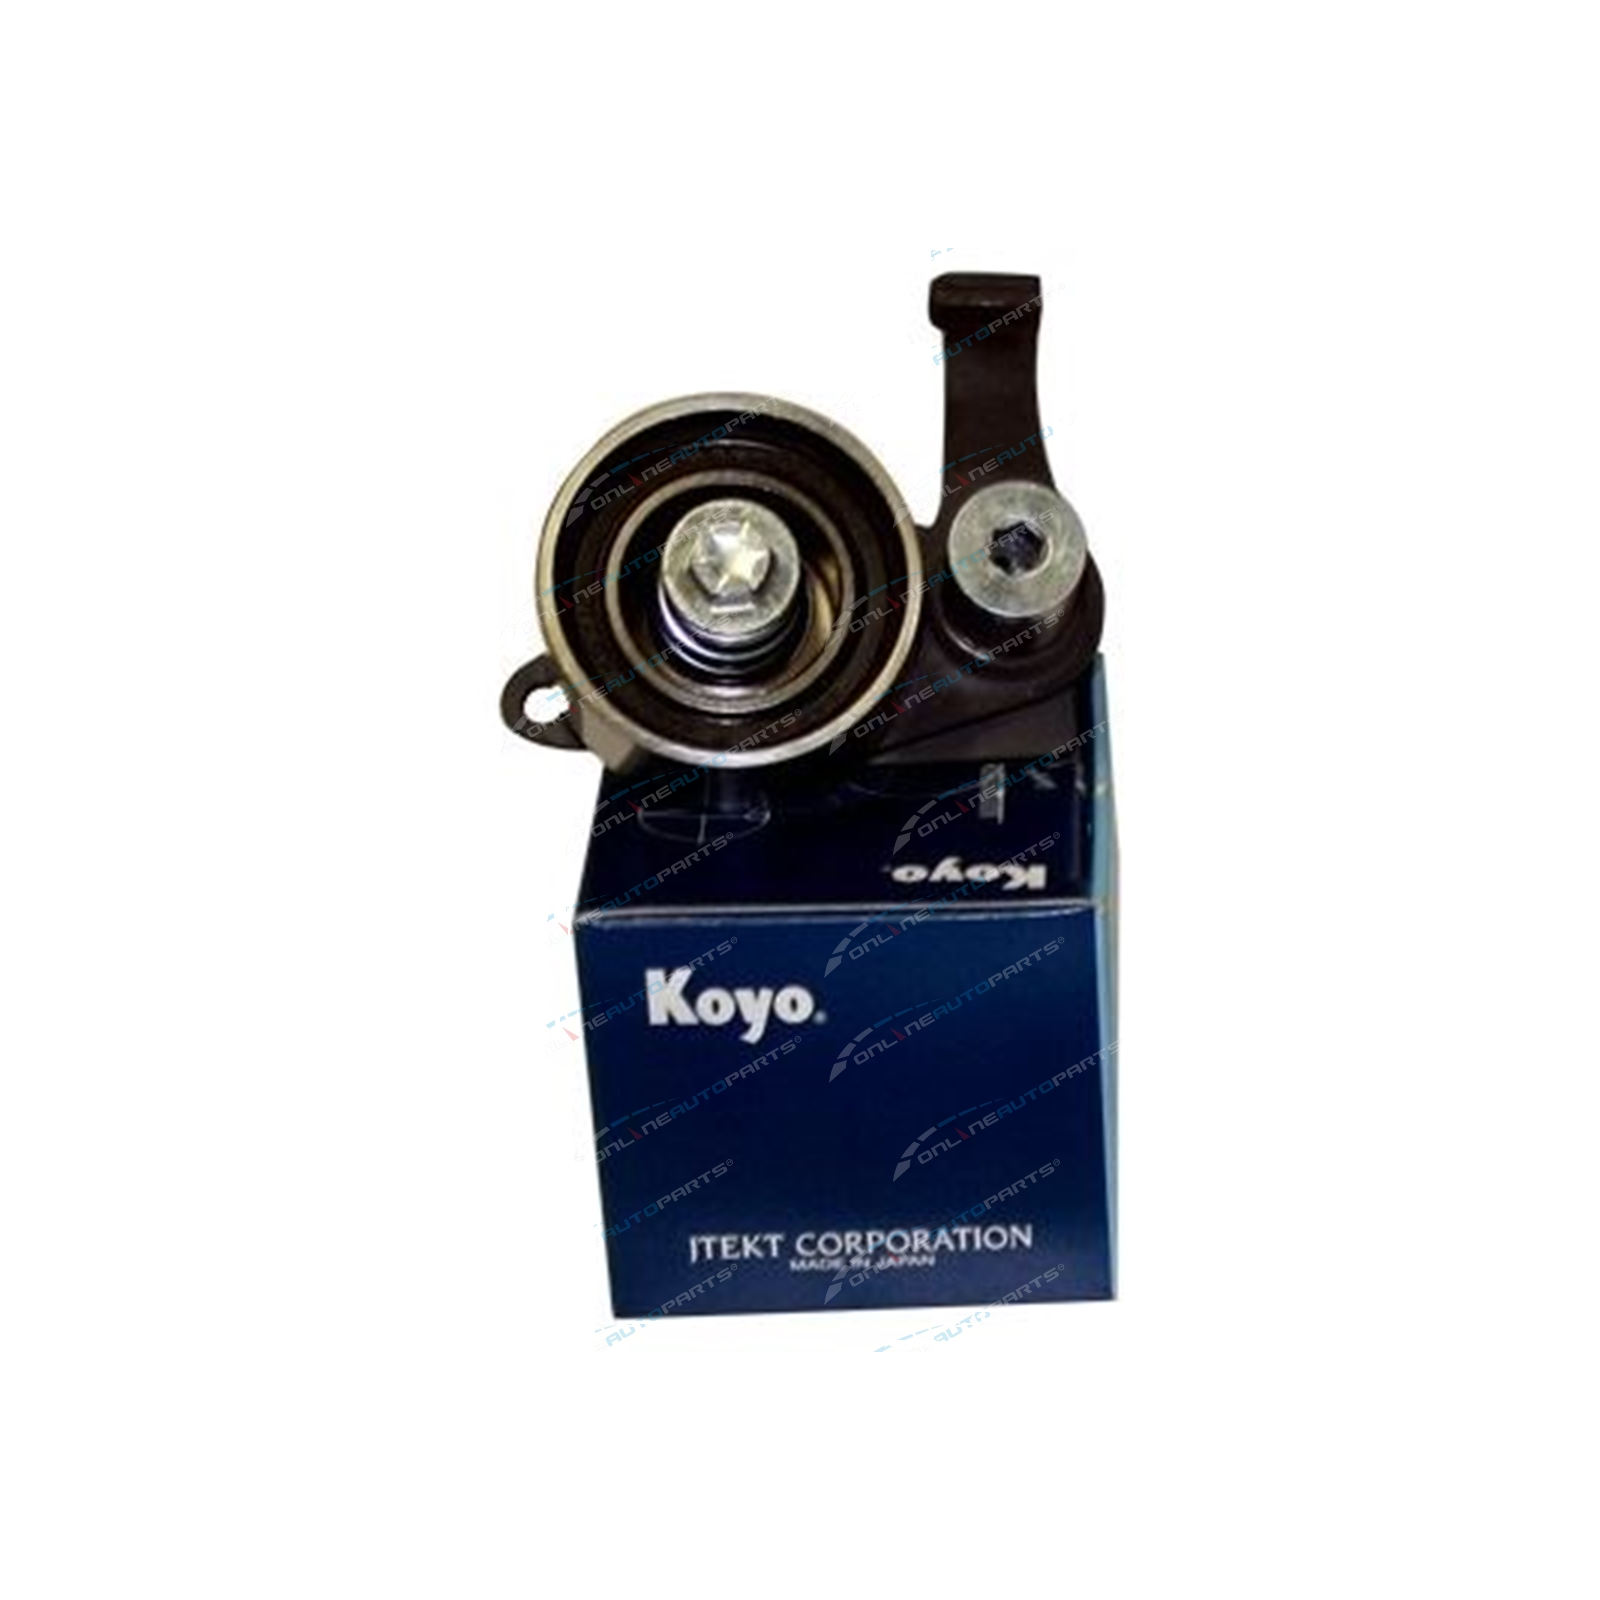 Tensioner Bearing U00135r Koyo Timing Belt Tensioner Koyo Bearings